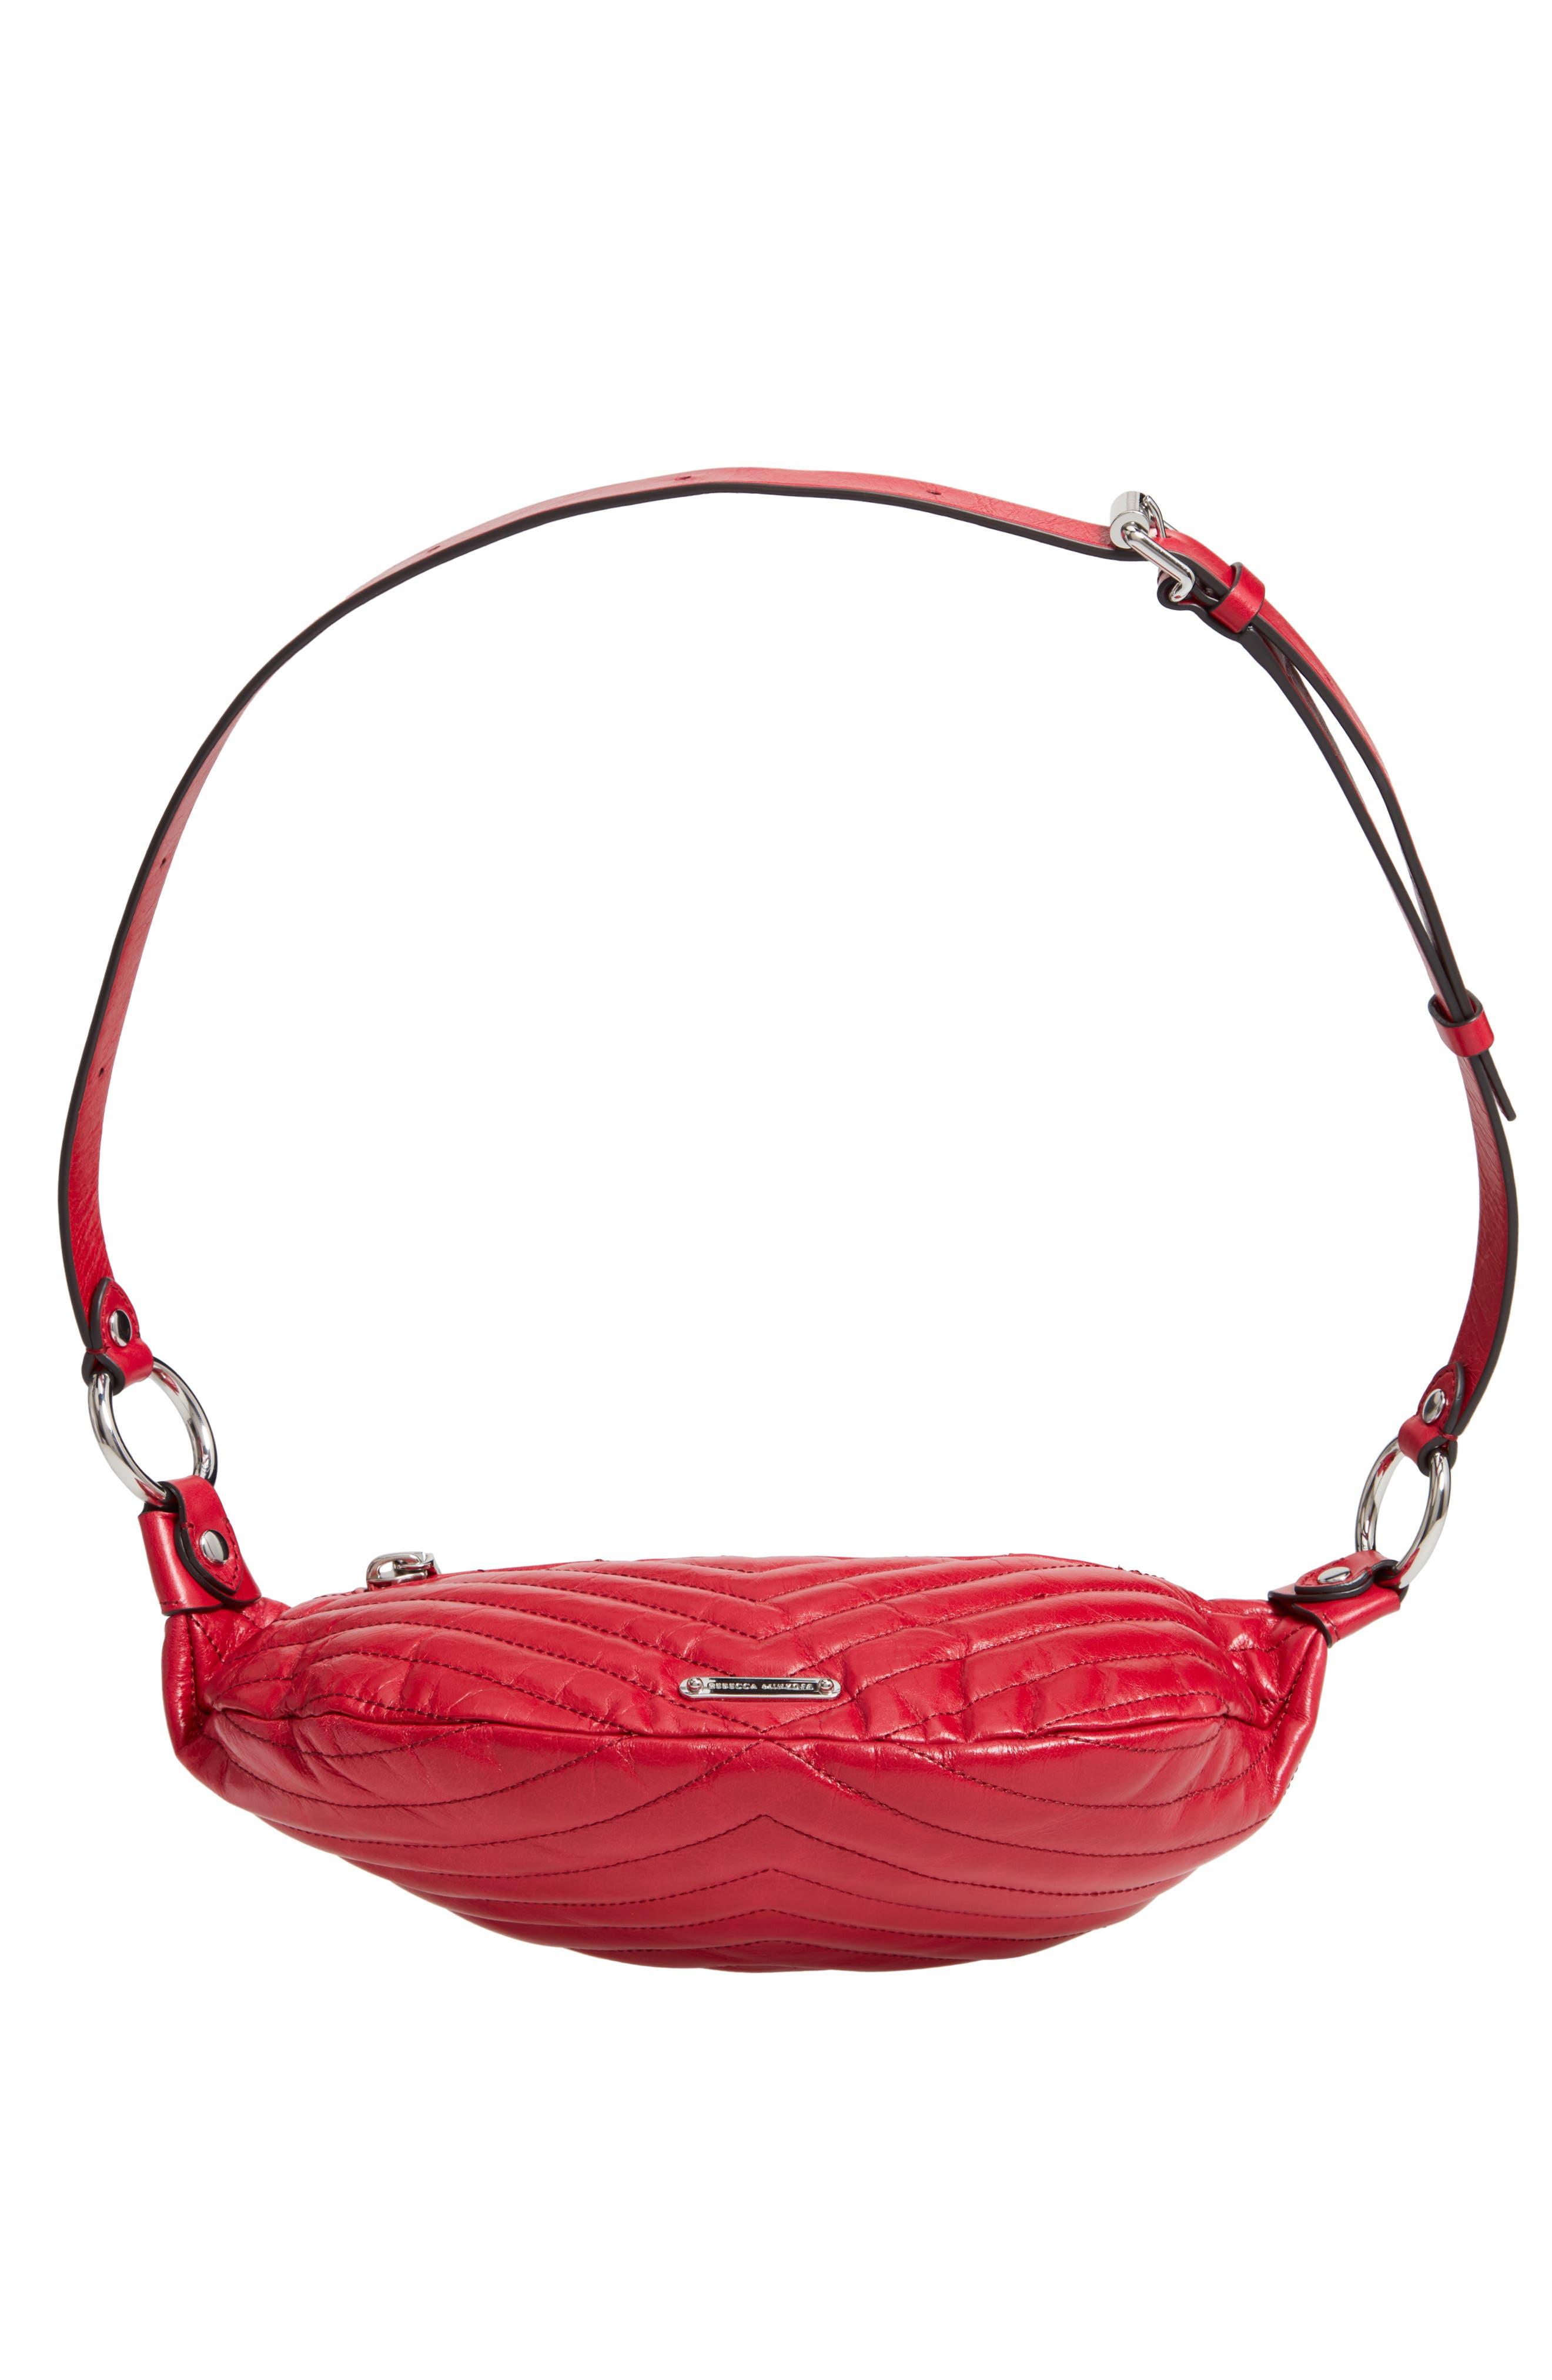 REBECCA MINKOFF, Edie Leather Belt Bag, Alternate thumbnail 8, color, 600